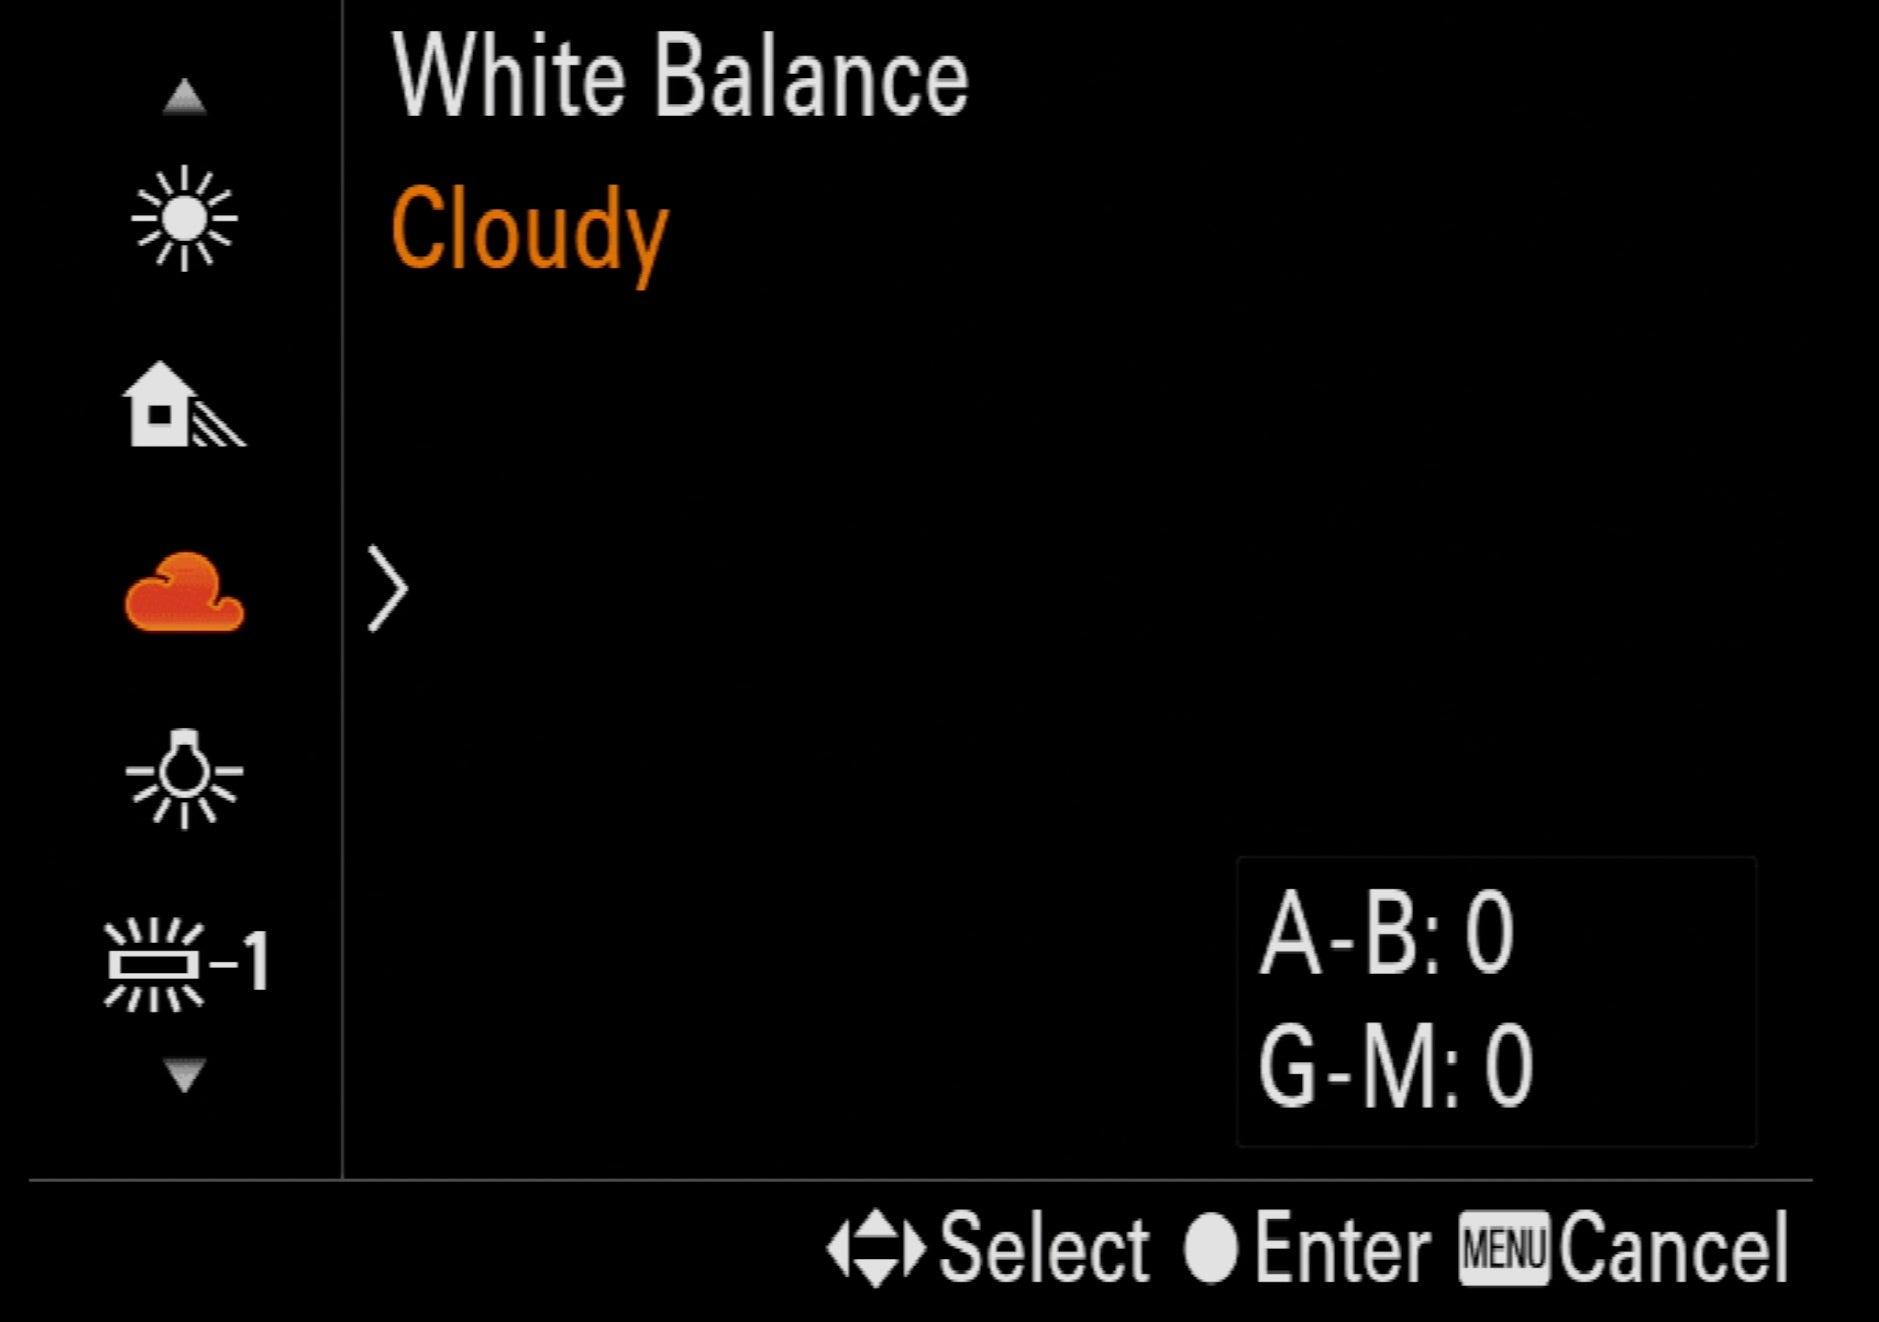 Alpha-Universe-Macro-Camera-Setup-White-Balance-Cloudy.jpeg